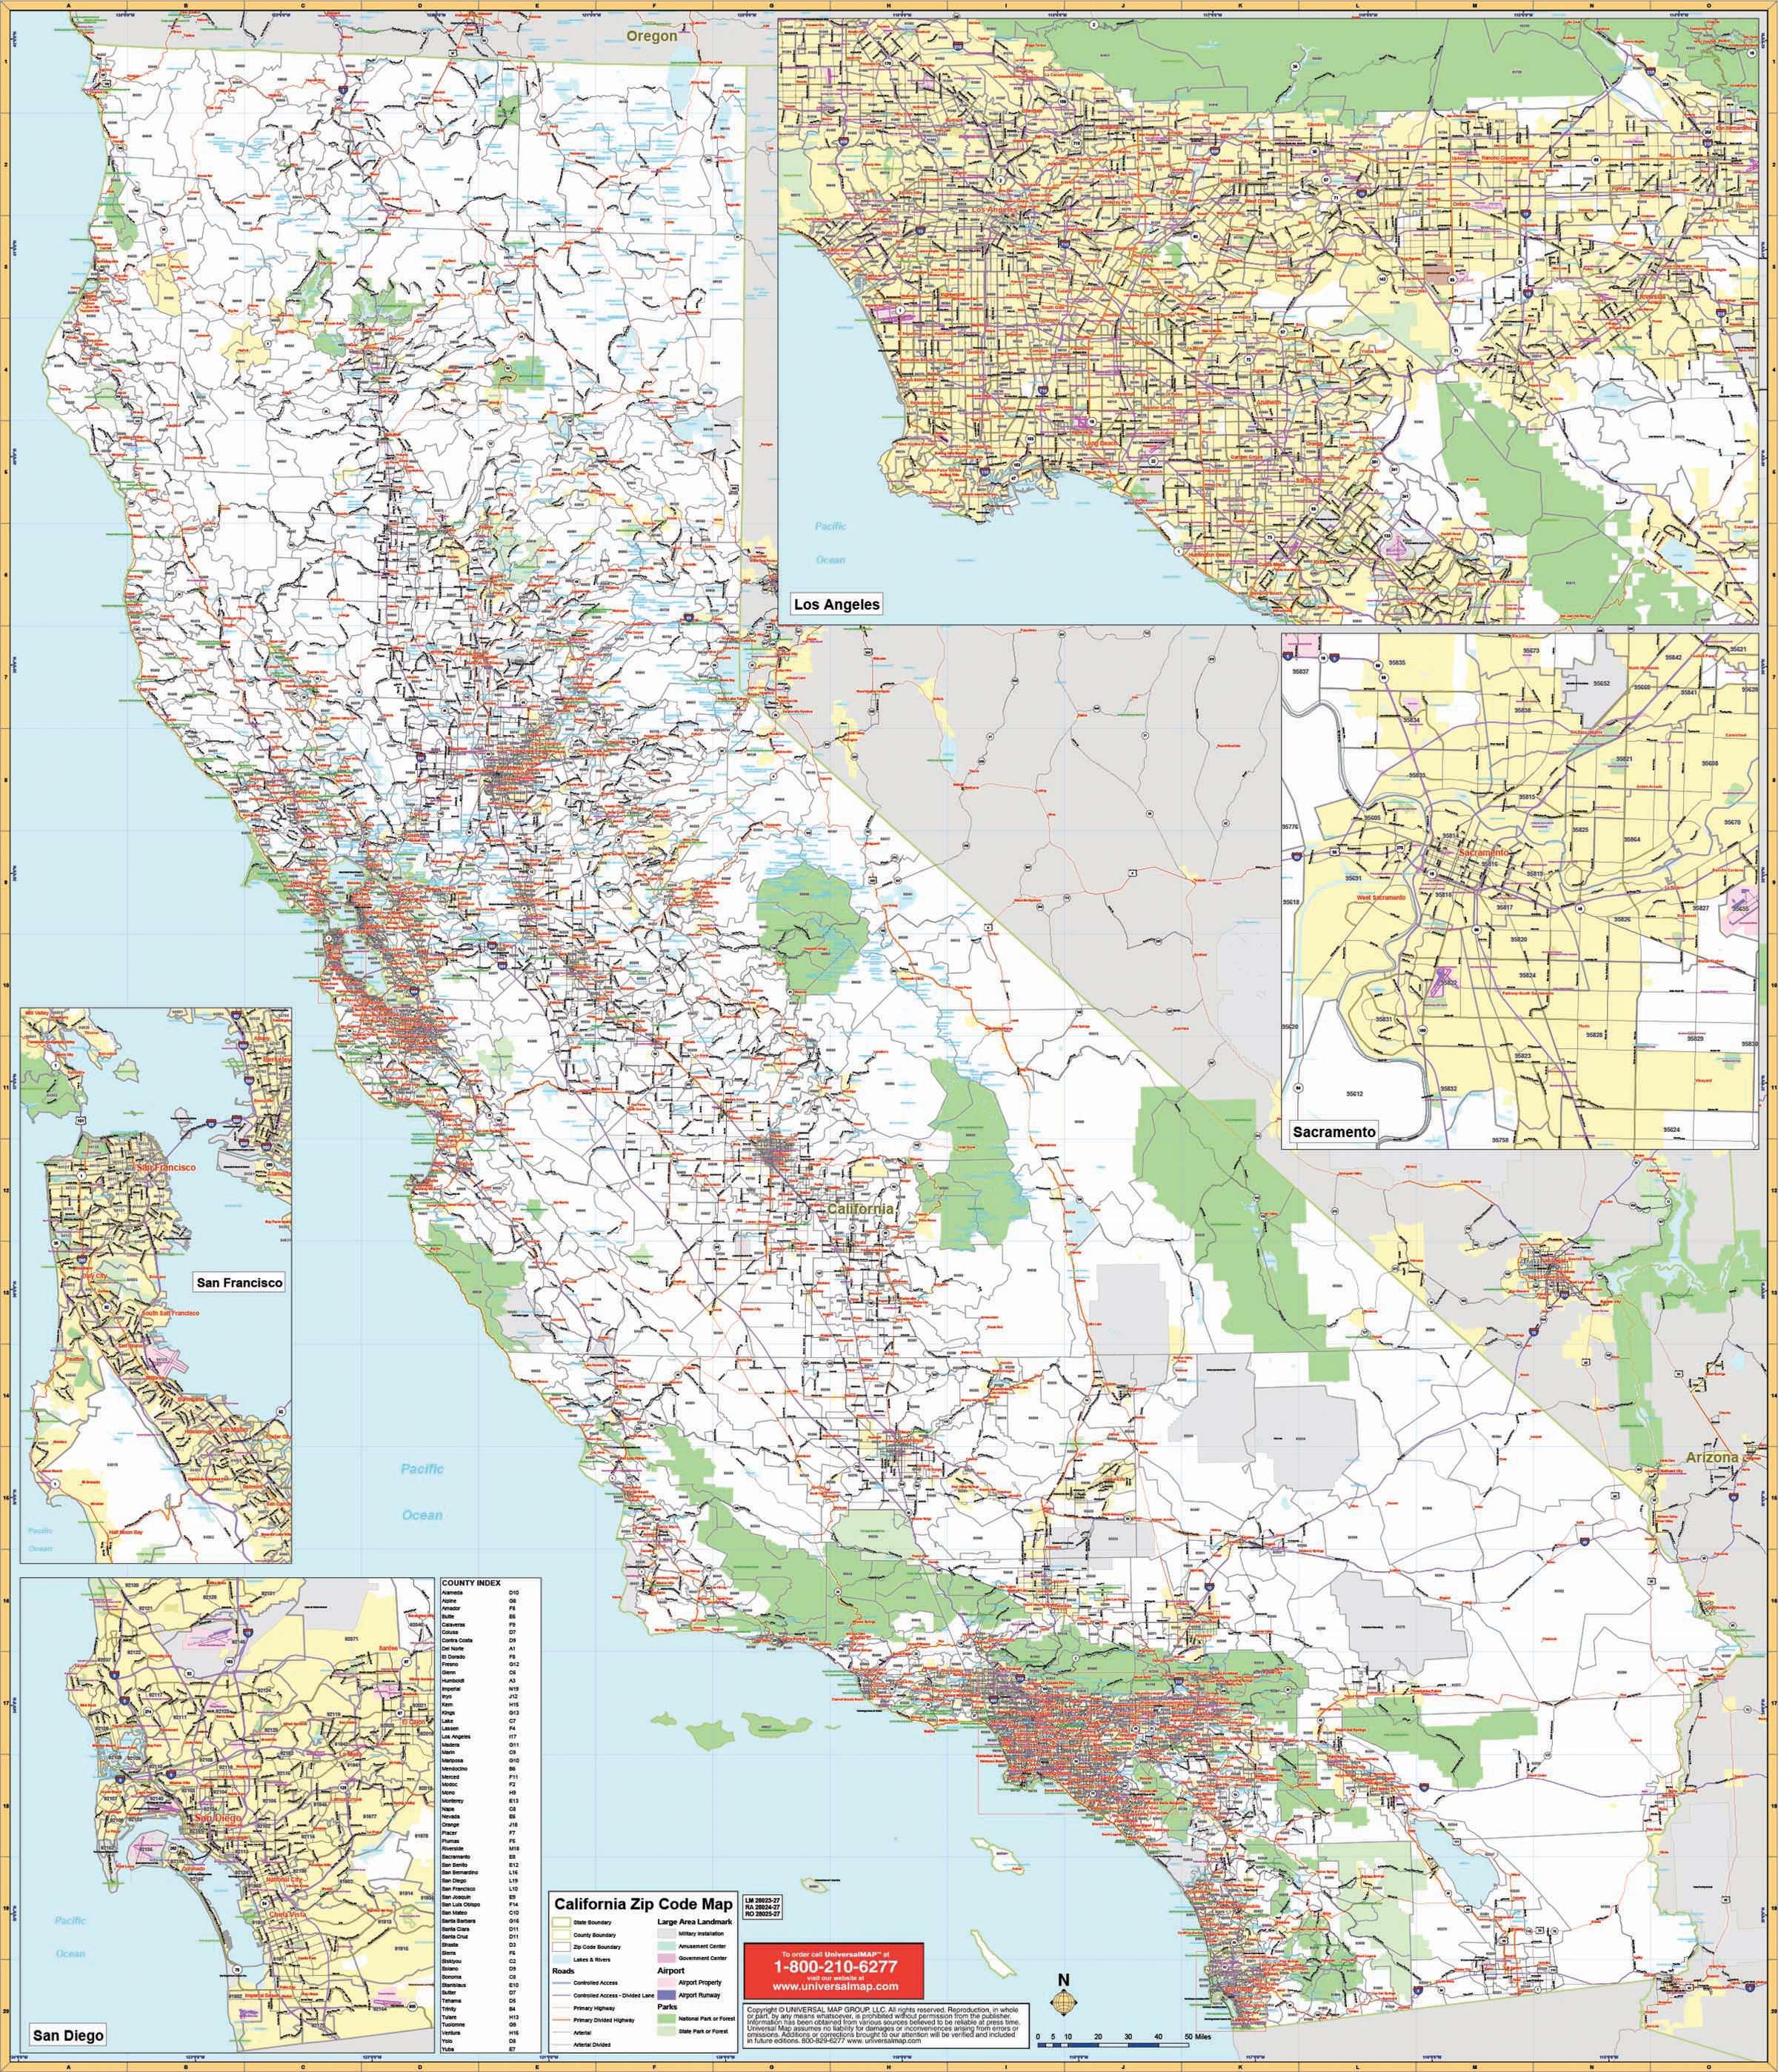 California State Wall Map W/ Zip Codes – Kappa Map Group - Large Wall Map Of California